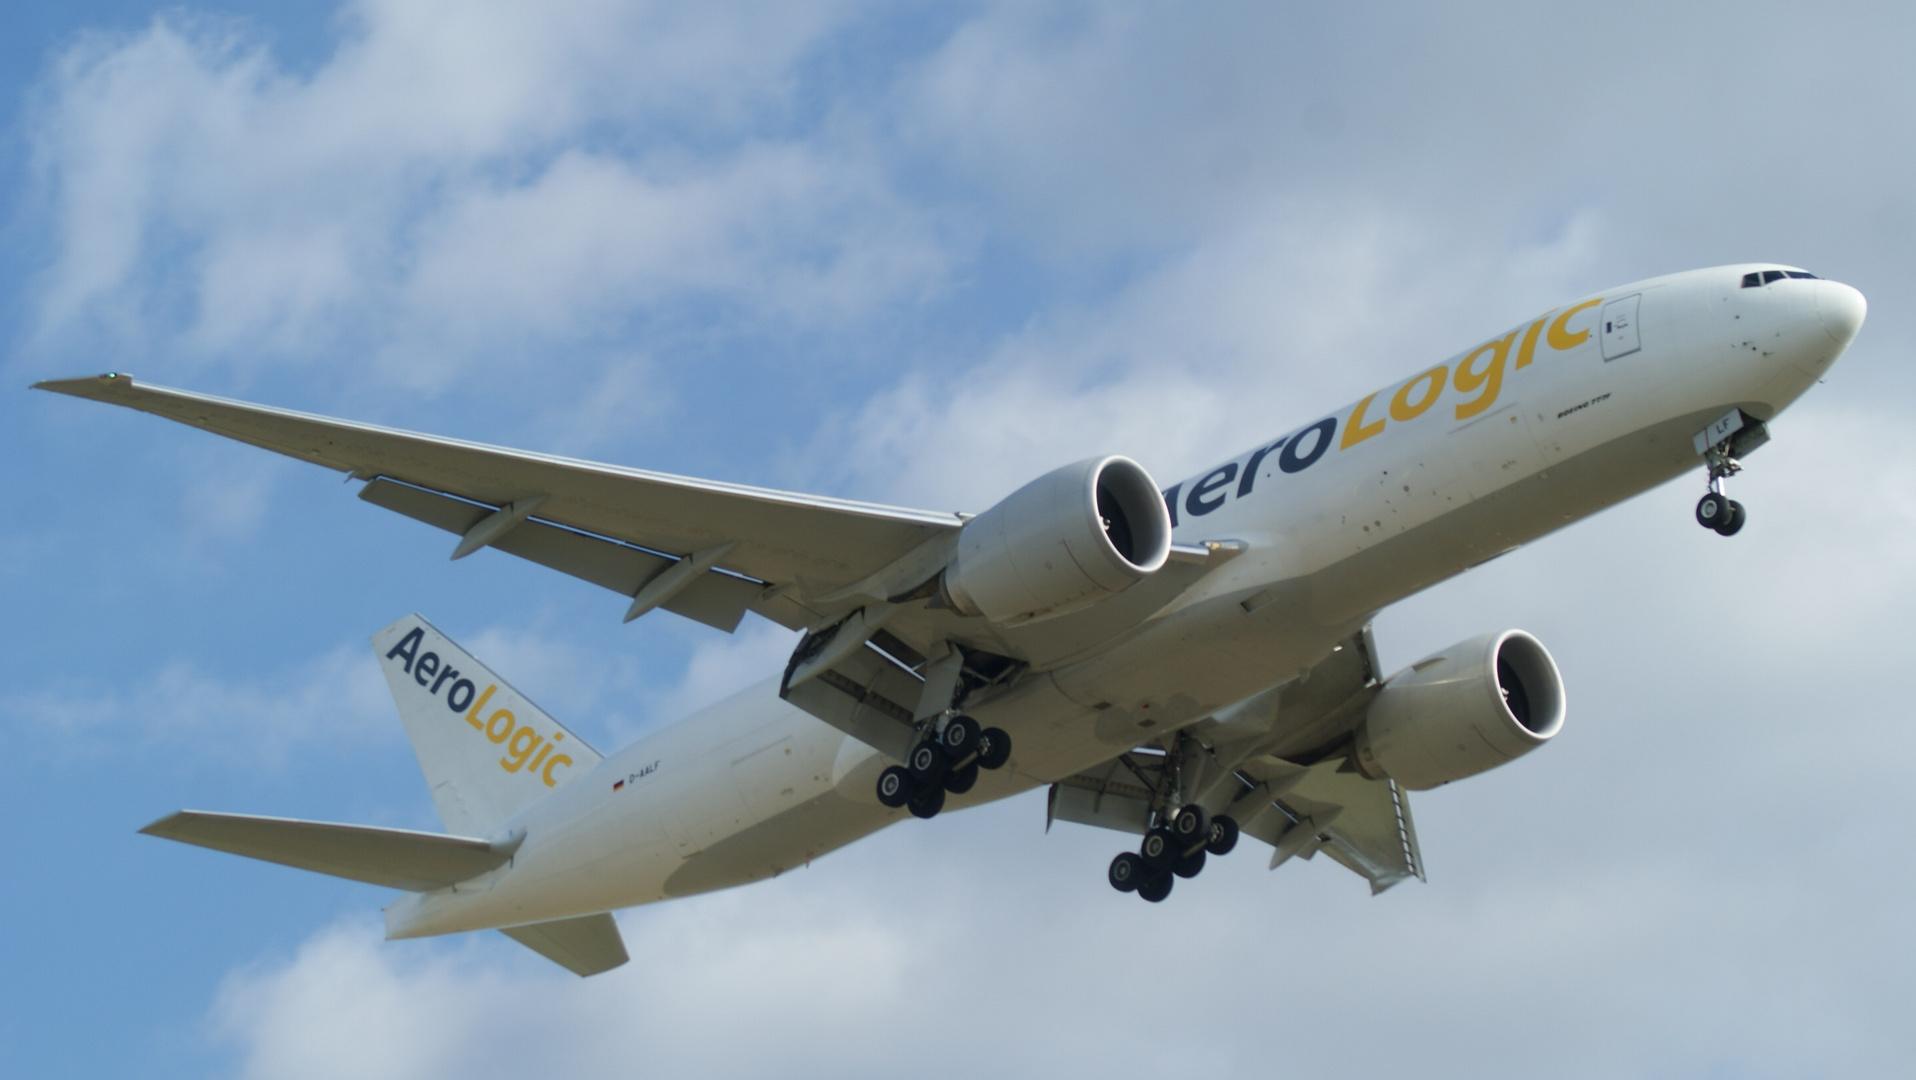 Aerologic B777